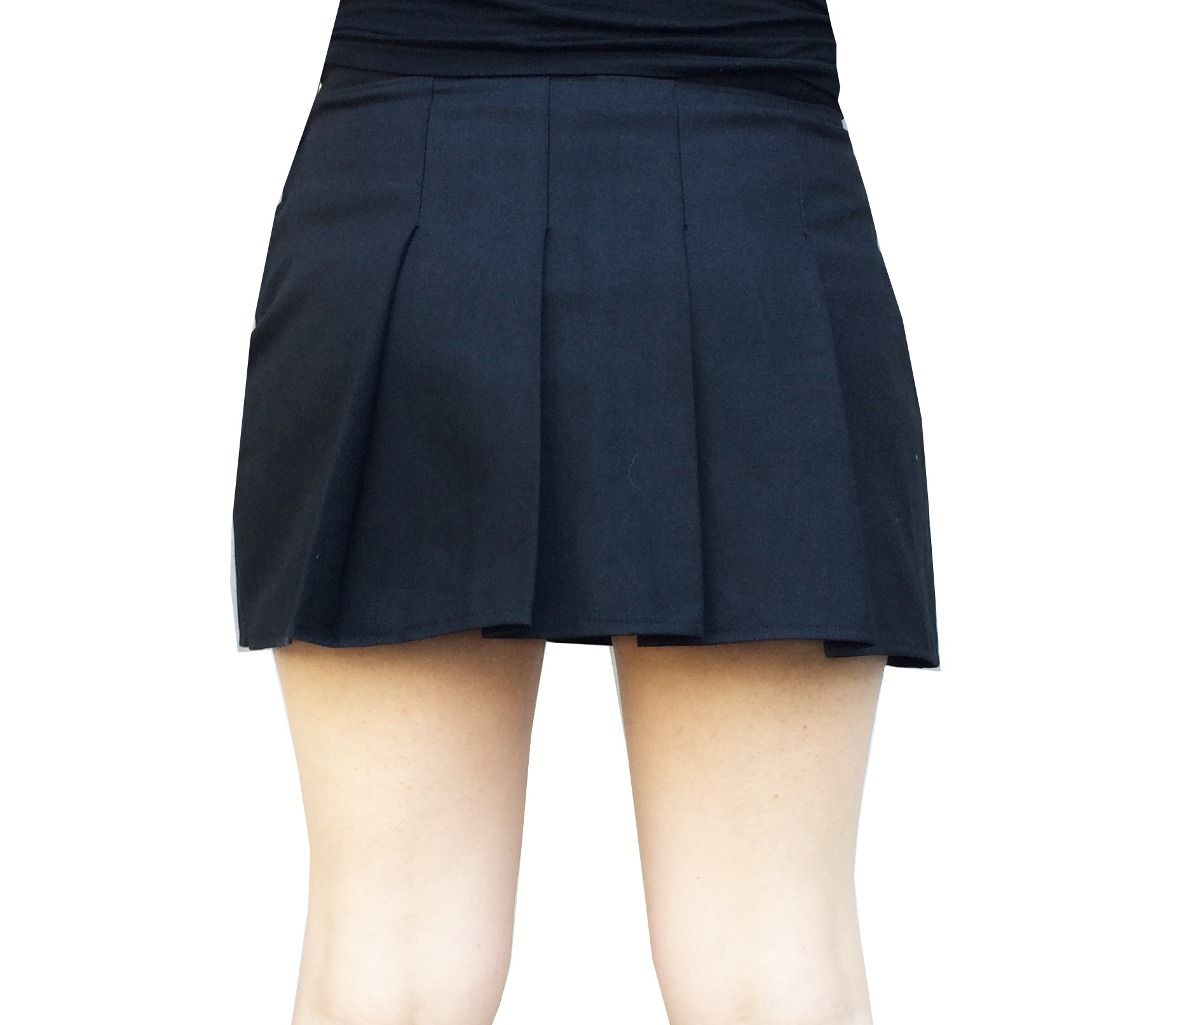 c833964e6 Modelos de falda tableada #falda #modelos #modelosdeFalda #tableada ...